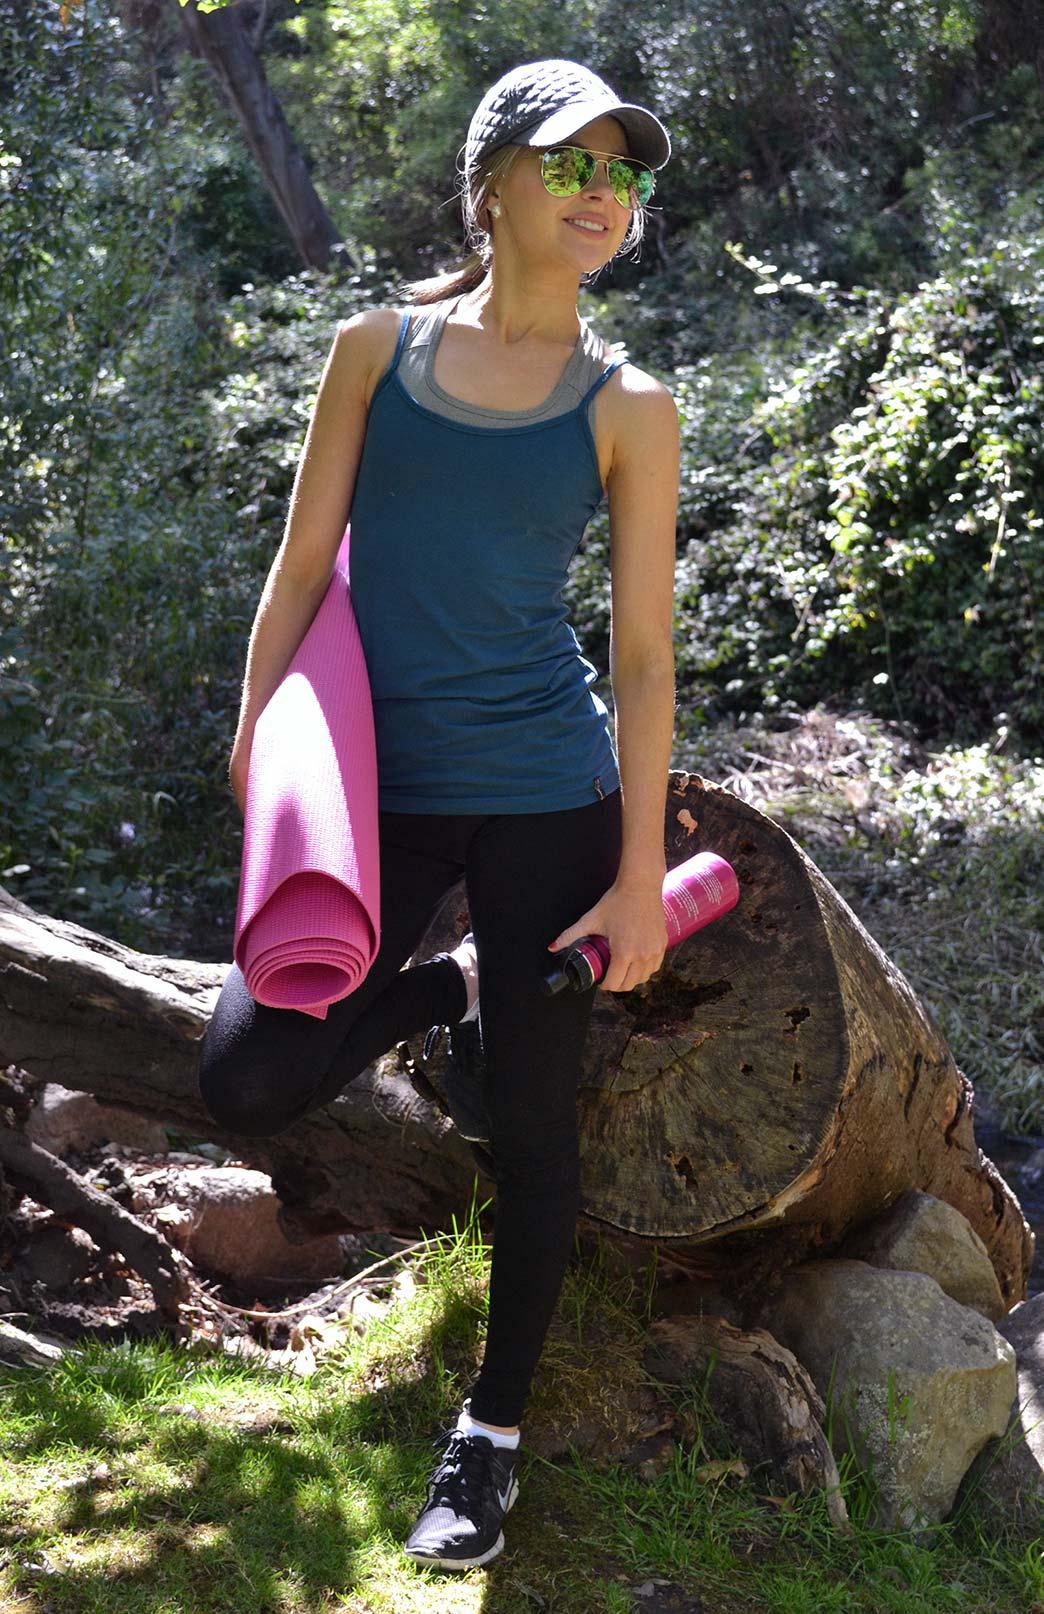 Camisole Top - Women's Wool Storm Teal Camisole Layering Thermal Tank Top - Smitten Merino Tasmania Australia